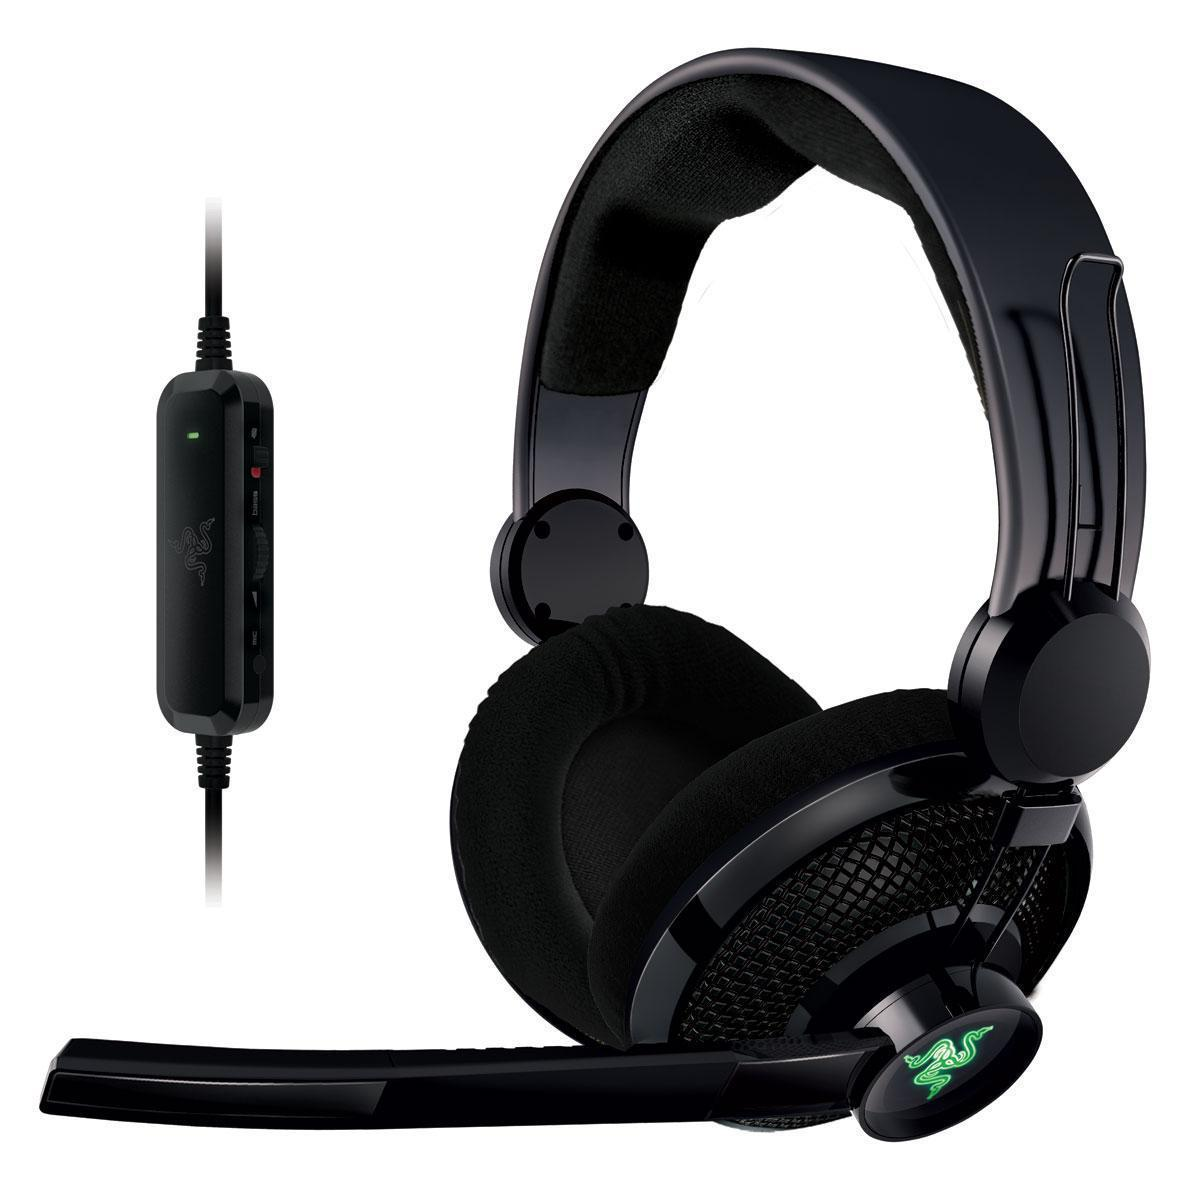 Auriculares Razer Carcharias para Xbox 360/PC + Micrófono - Negro